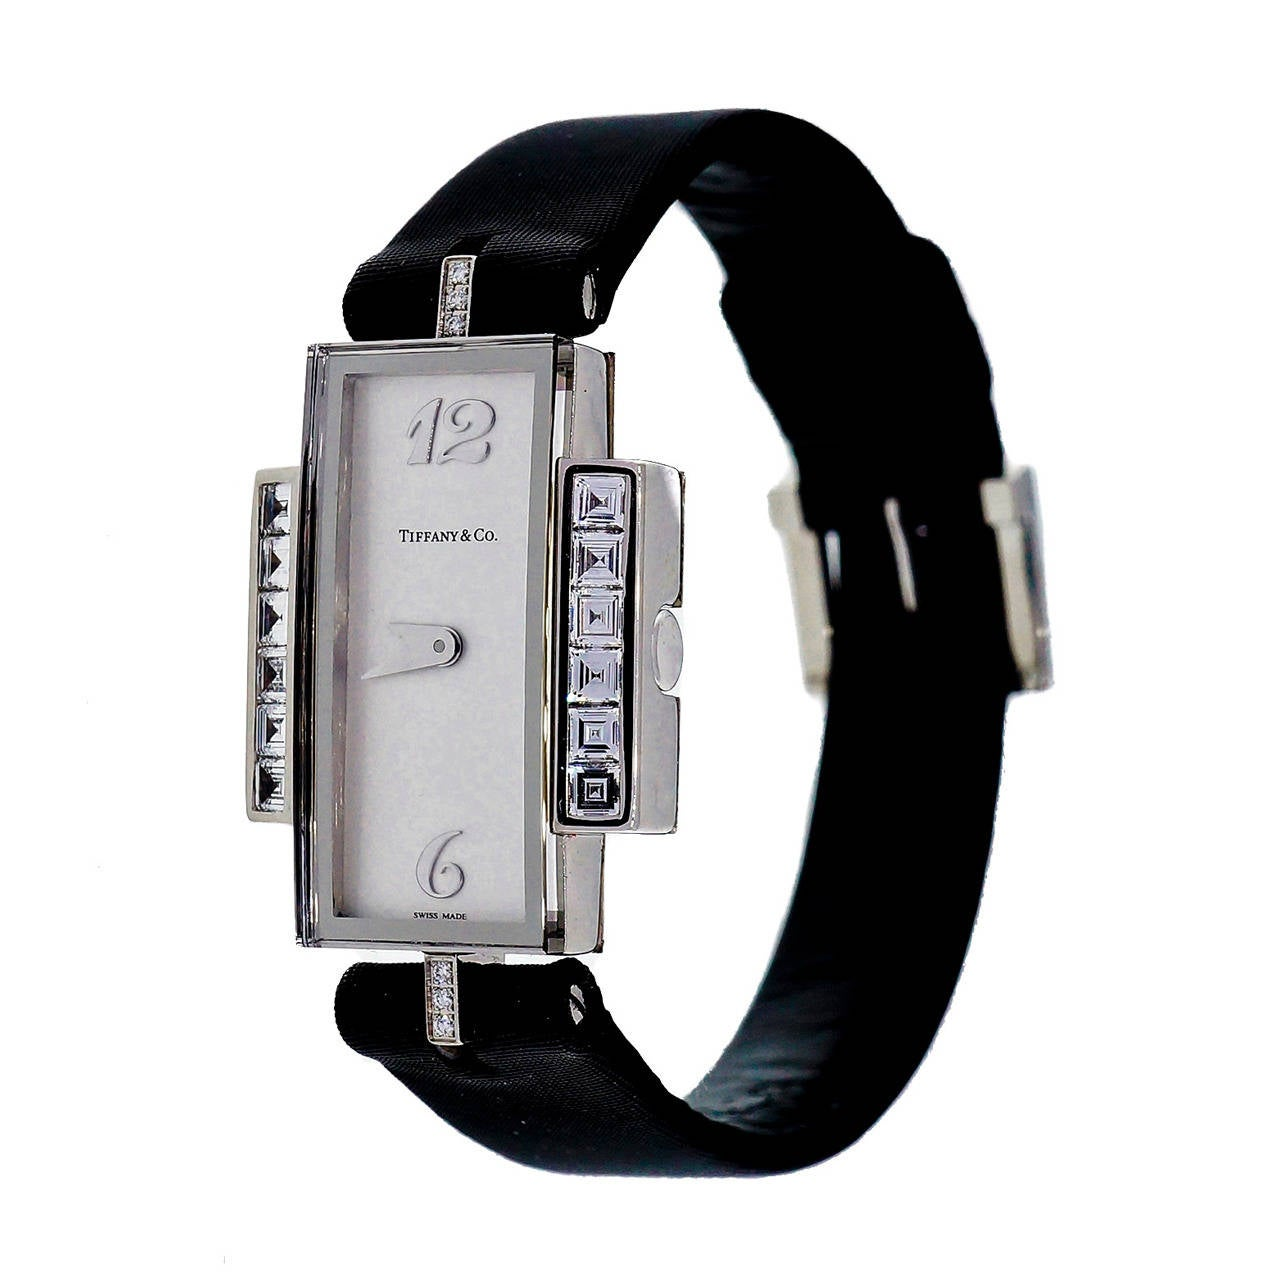 Tiffany & Co Lady's White Gold and Diamond Wristwatch